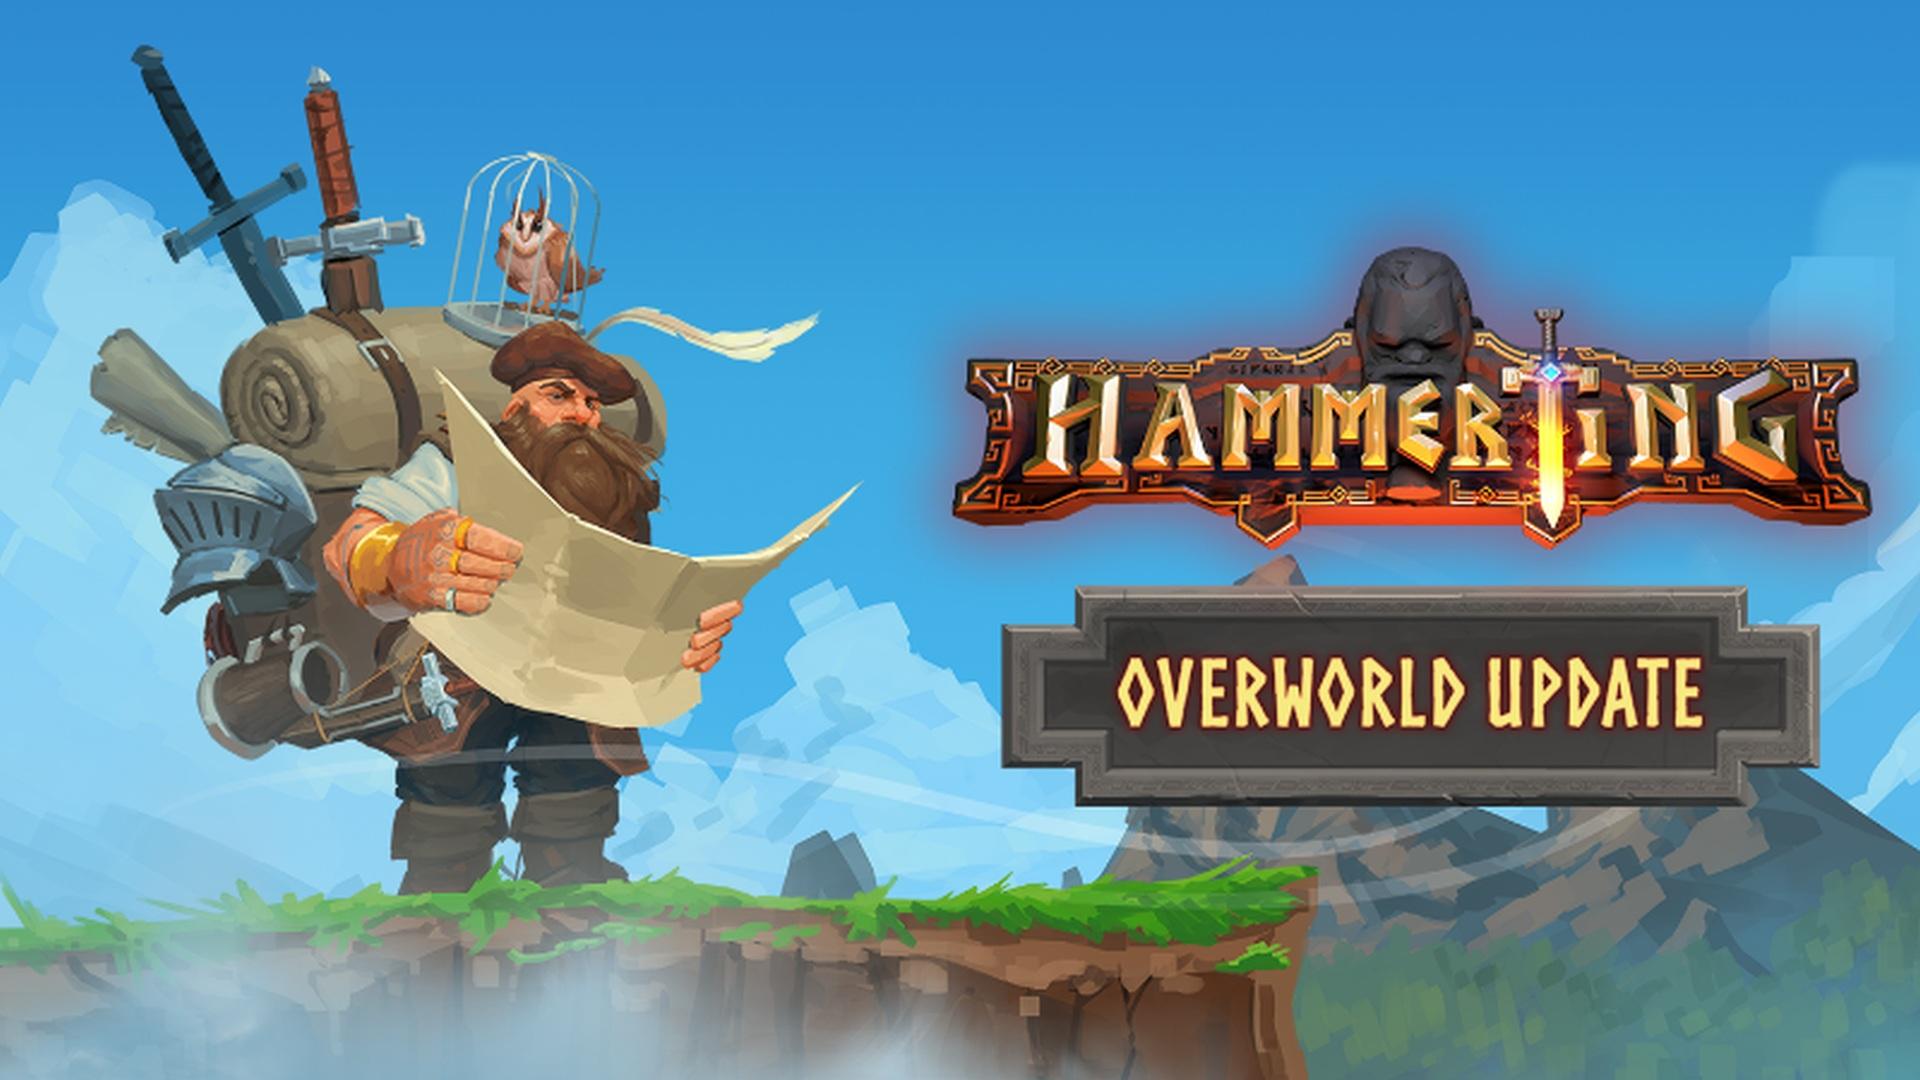 Hammerting - Overworld Update | Warpzone Studios, Team17